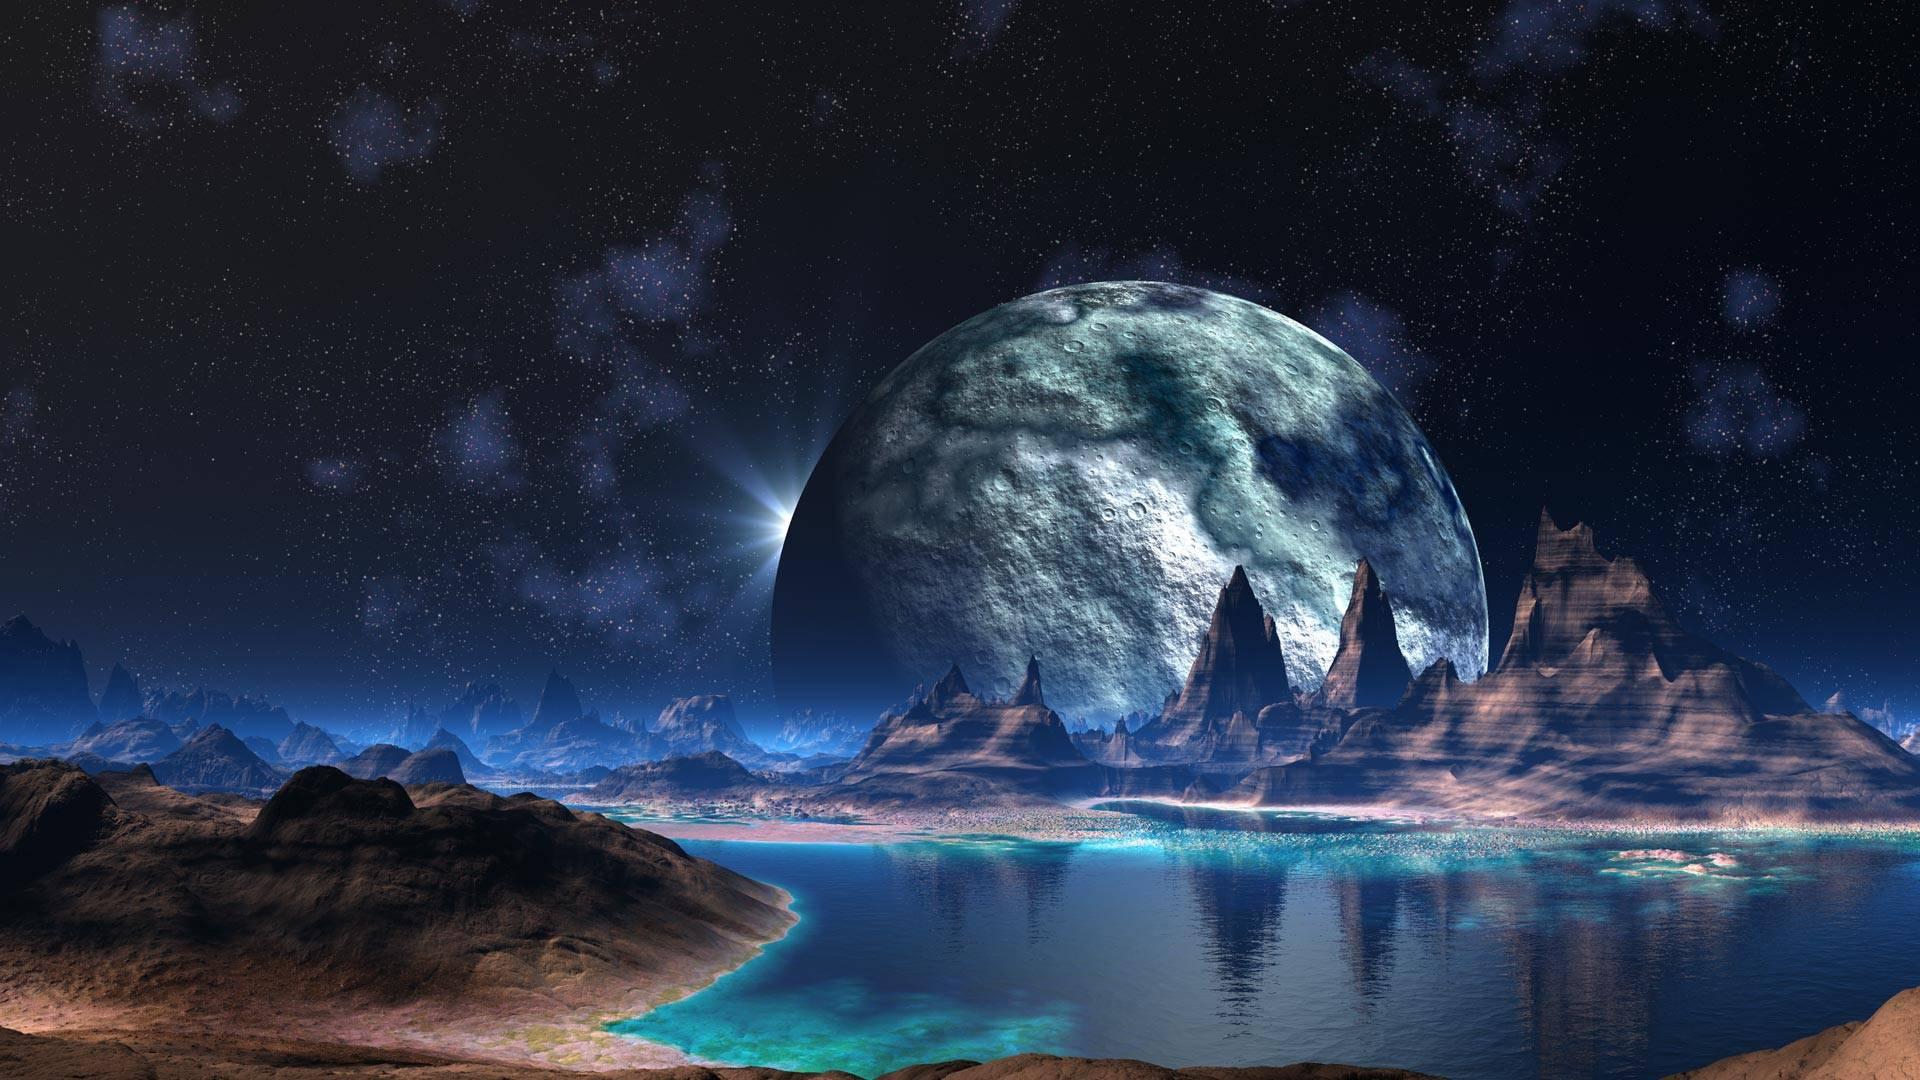 sci fi backgrounds - photo #22